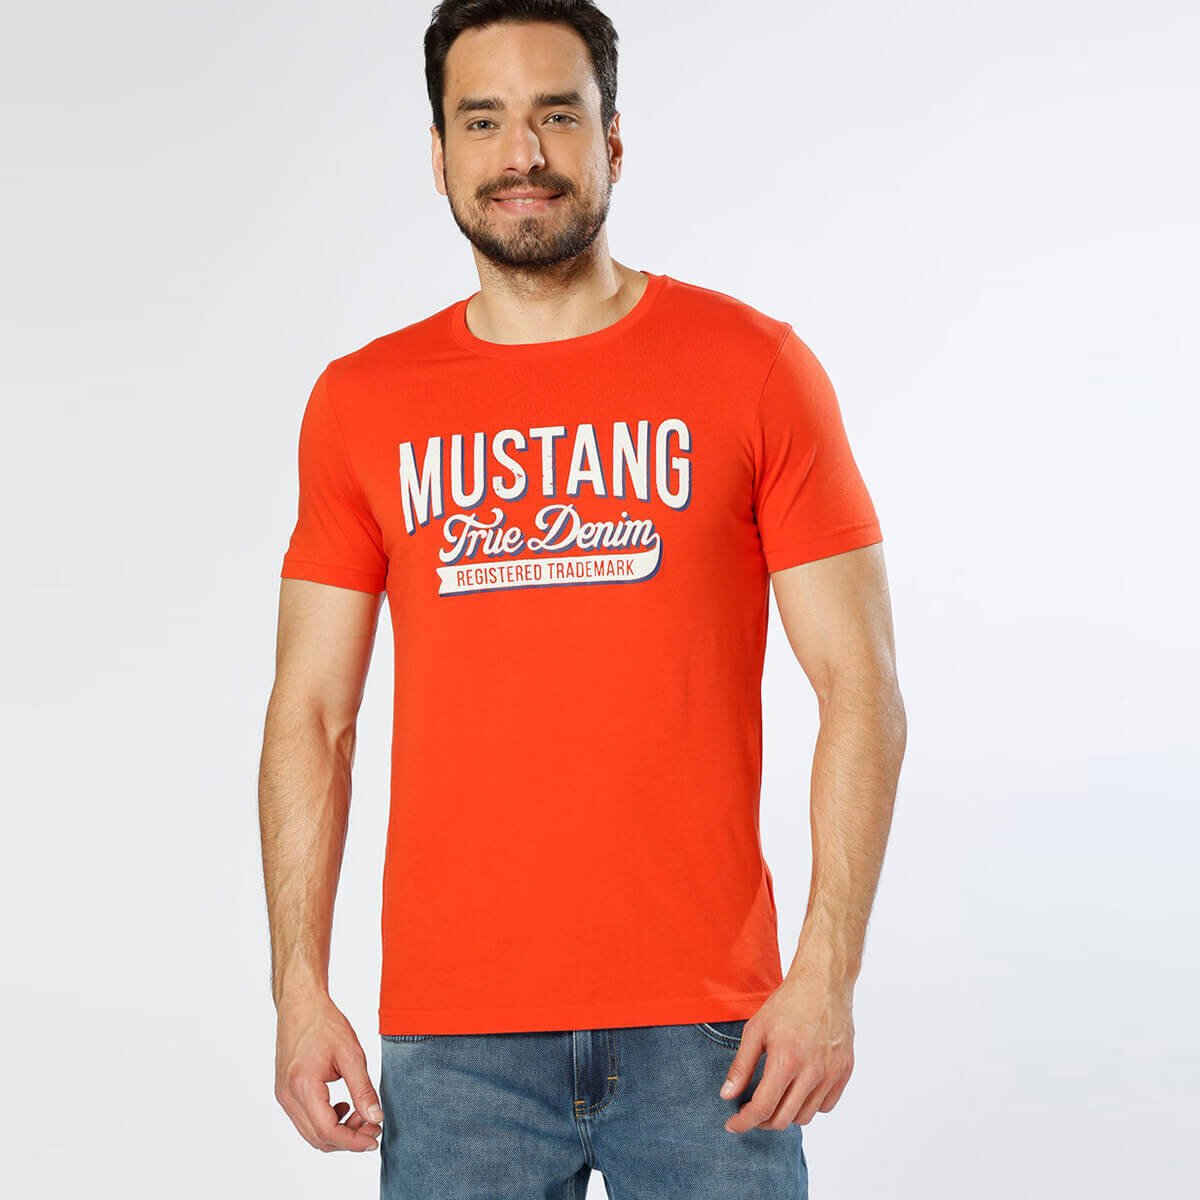 TURUNCU Erkek T-Shirt 04-M00104-800